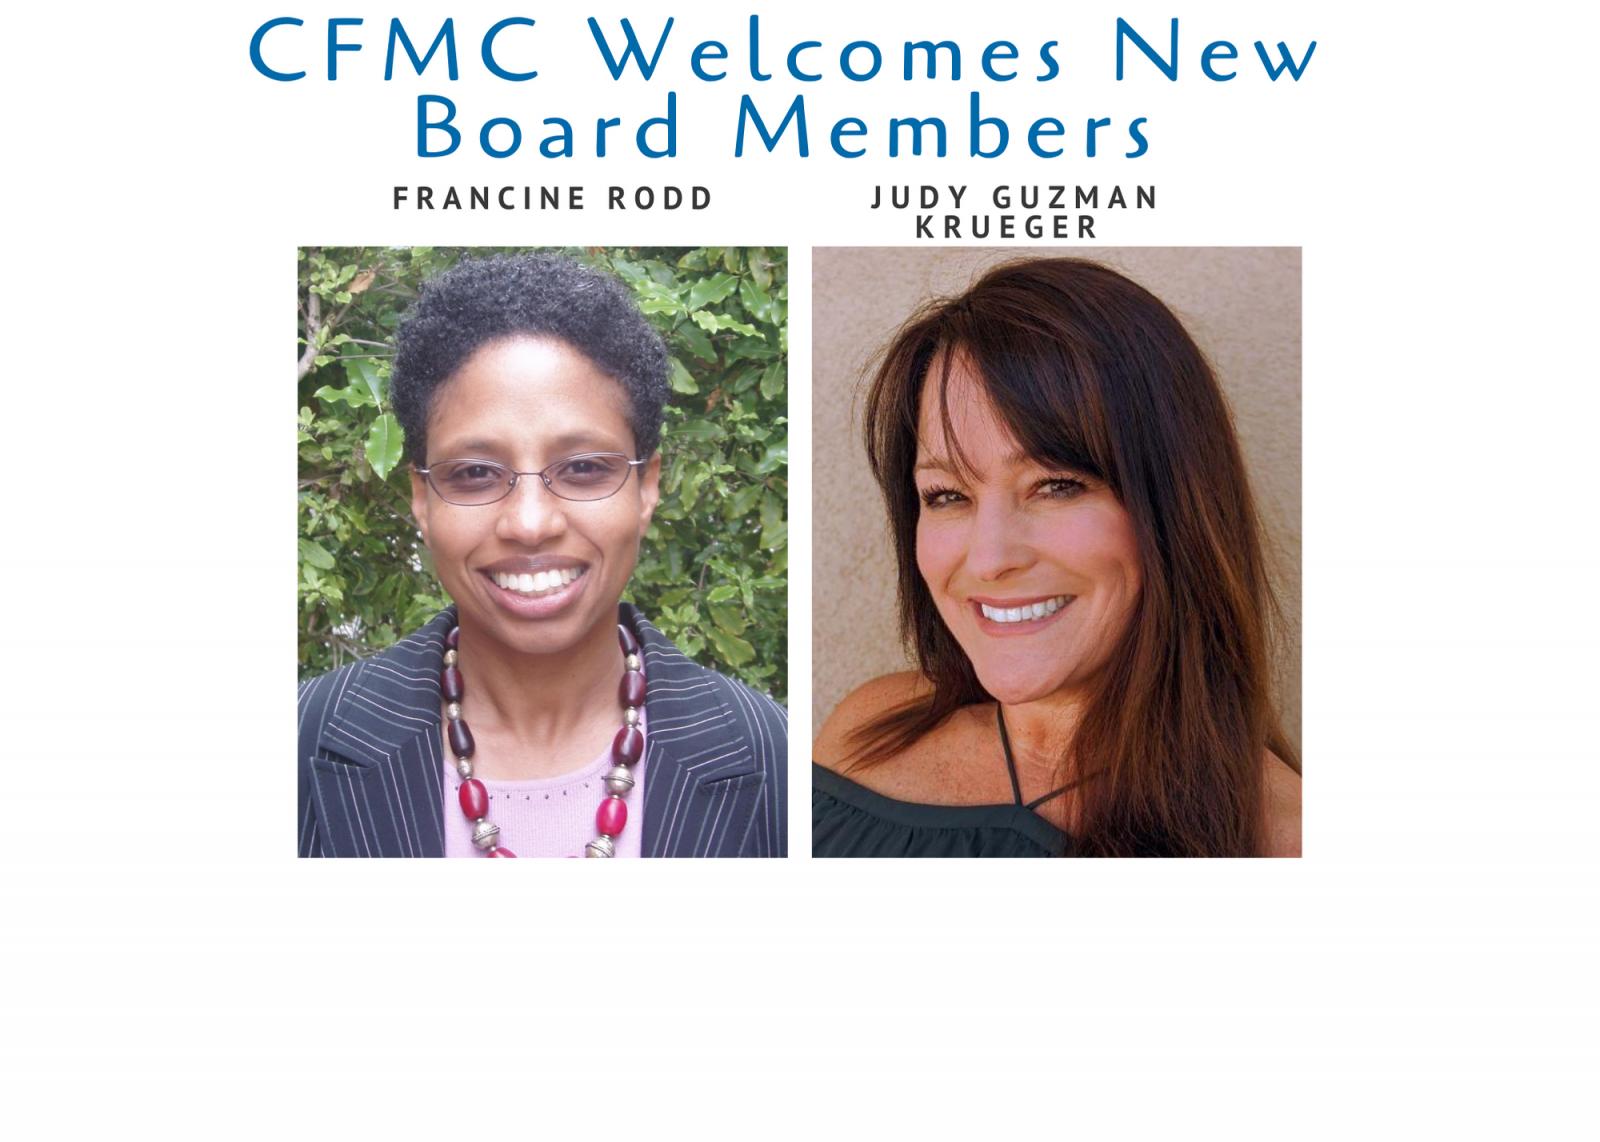 CFMC Names Francine Rodd, Judy Guzman Krueger to Board of Directors